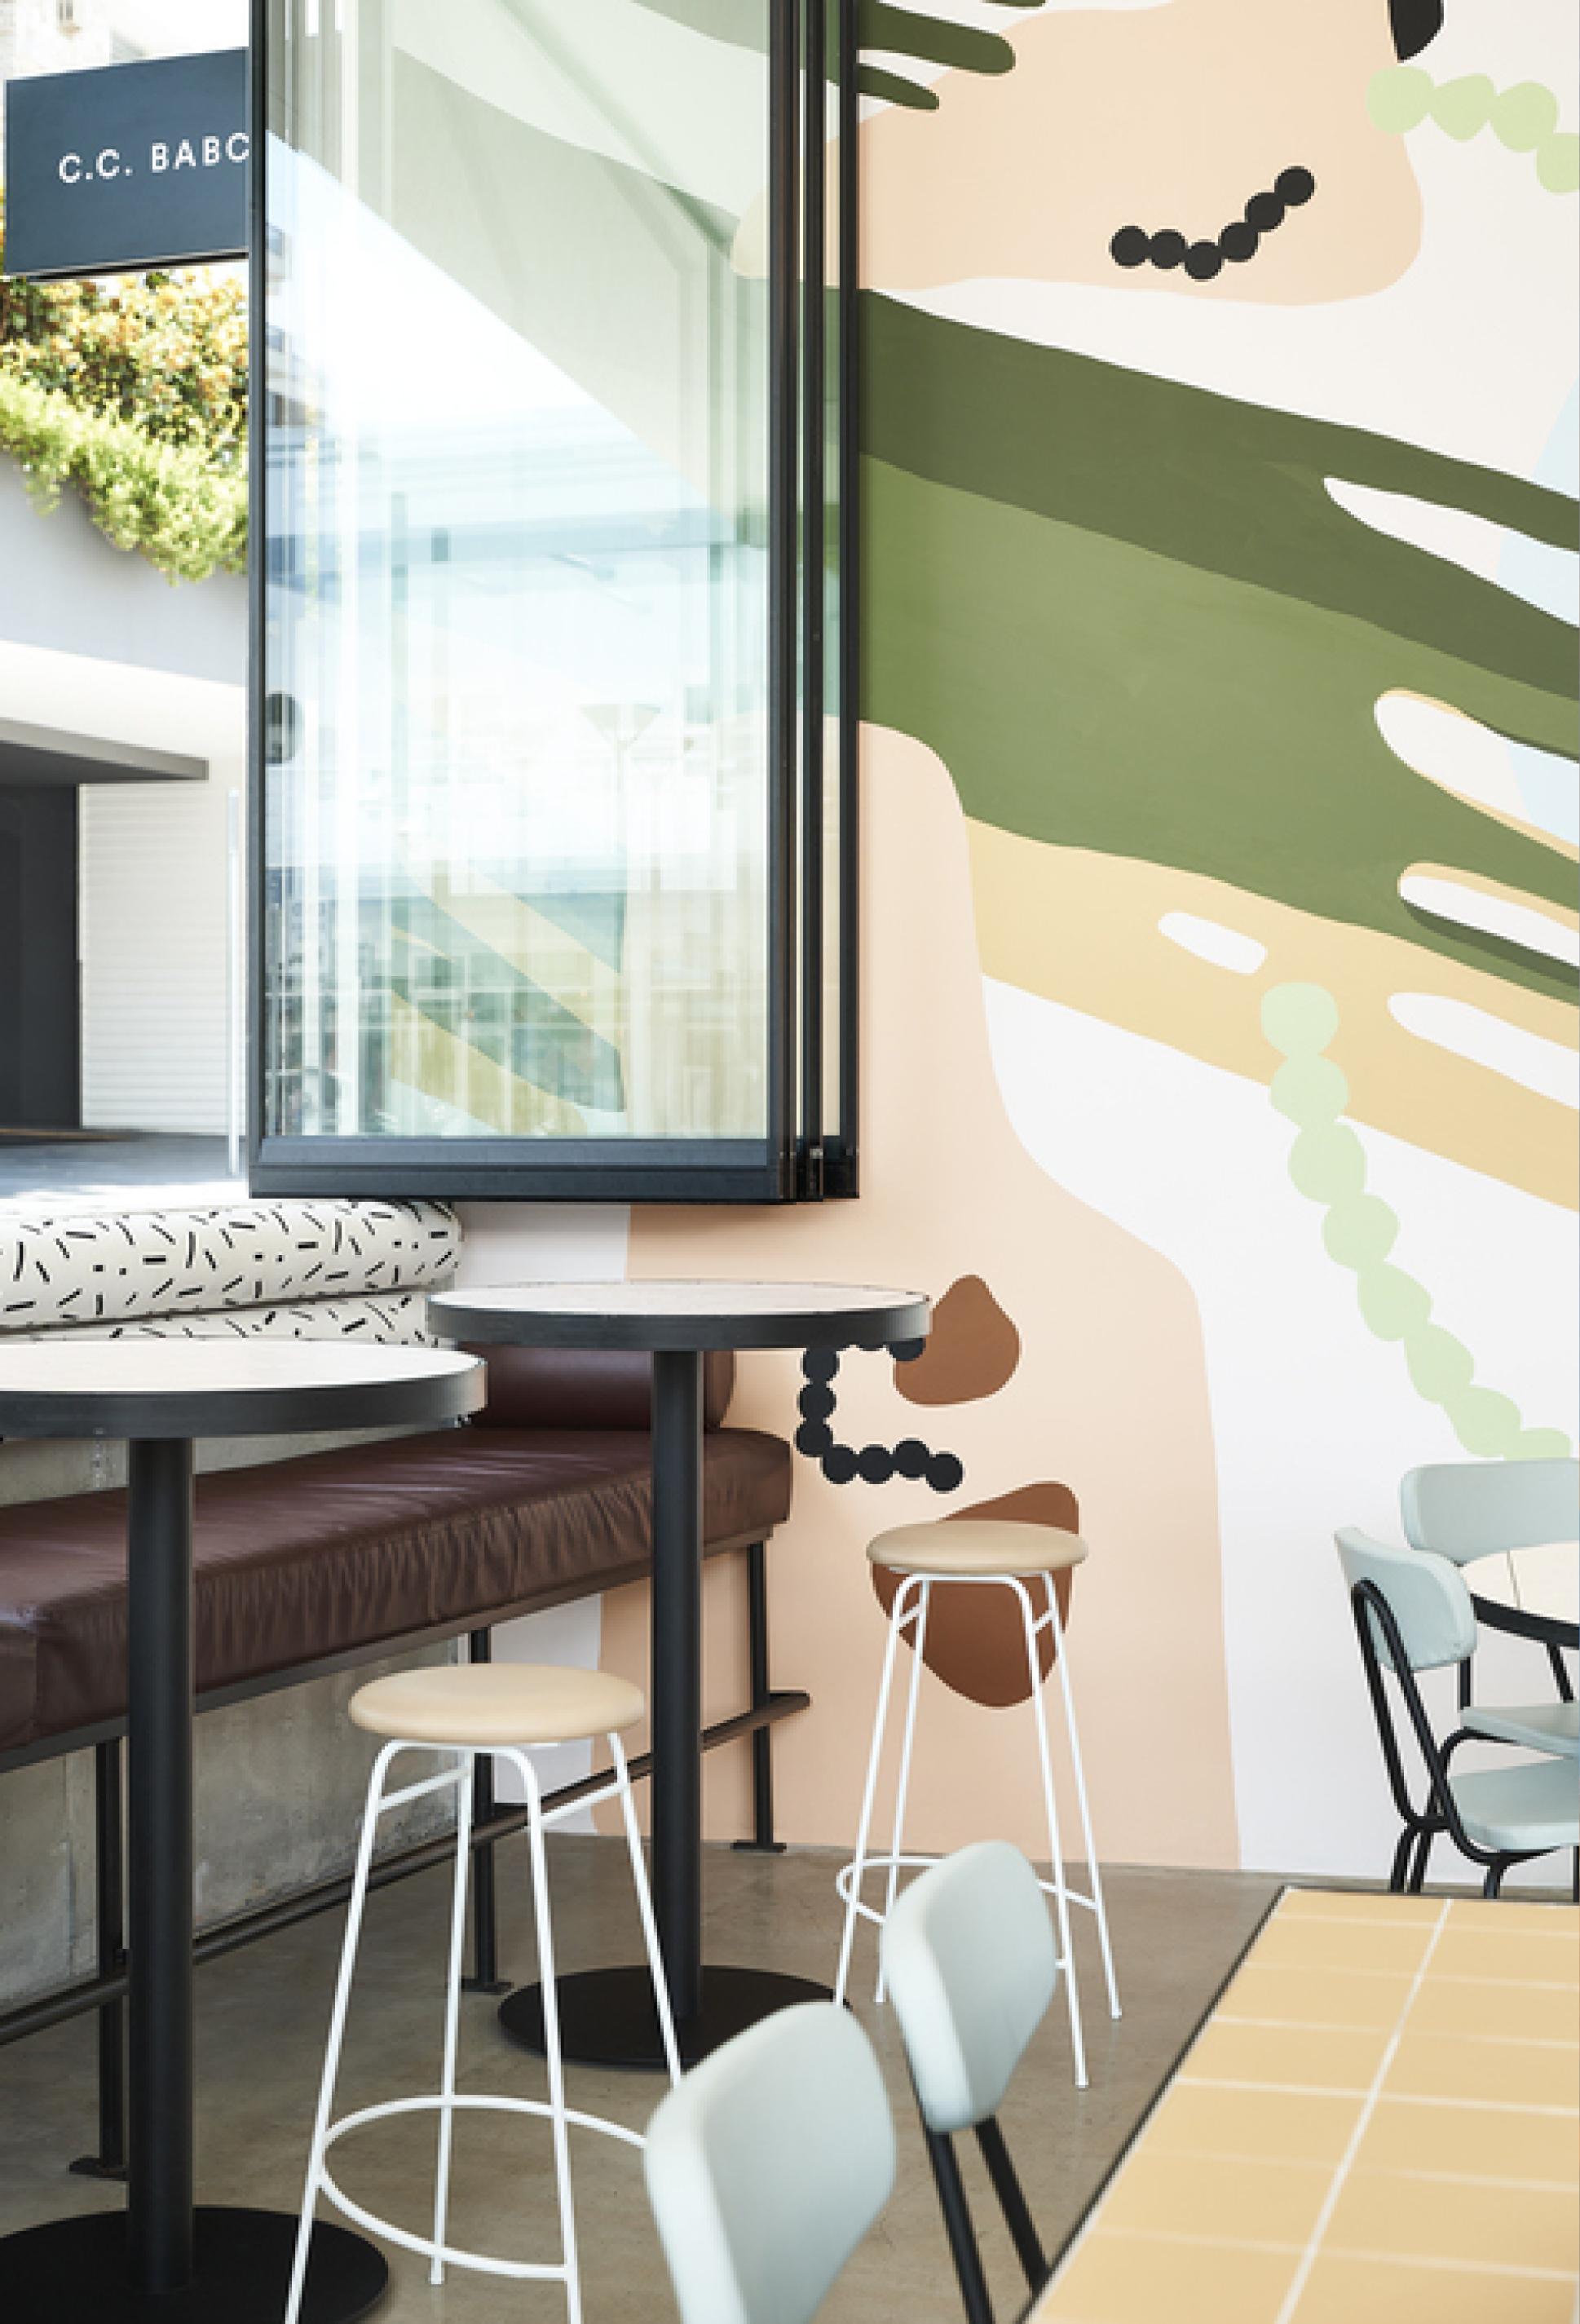 restaurant seating and restaurant design trends of 2019